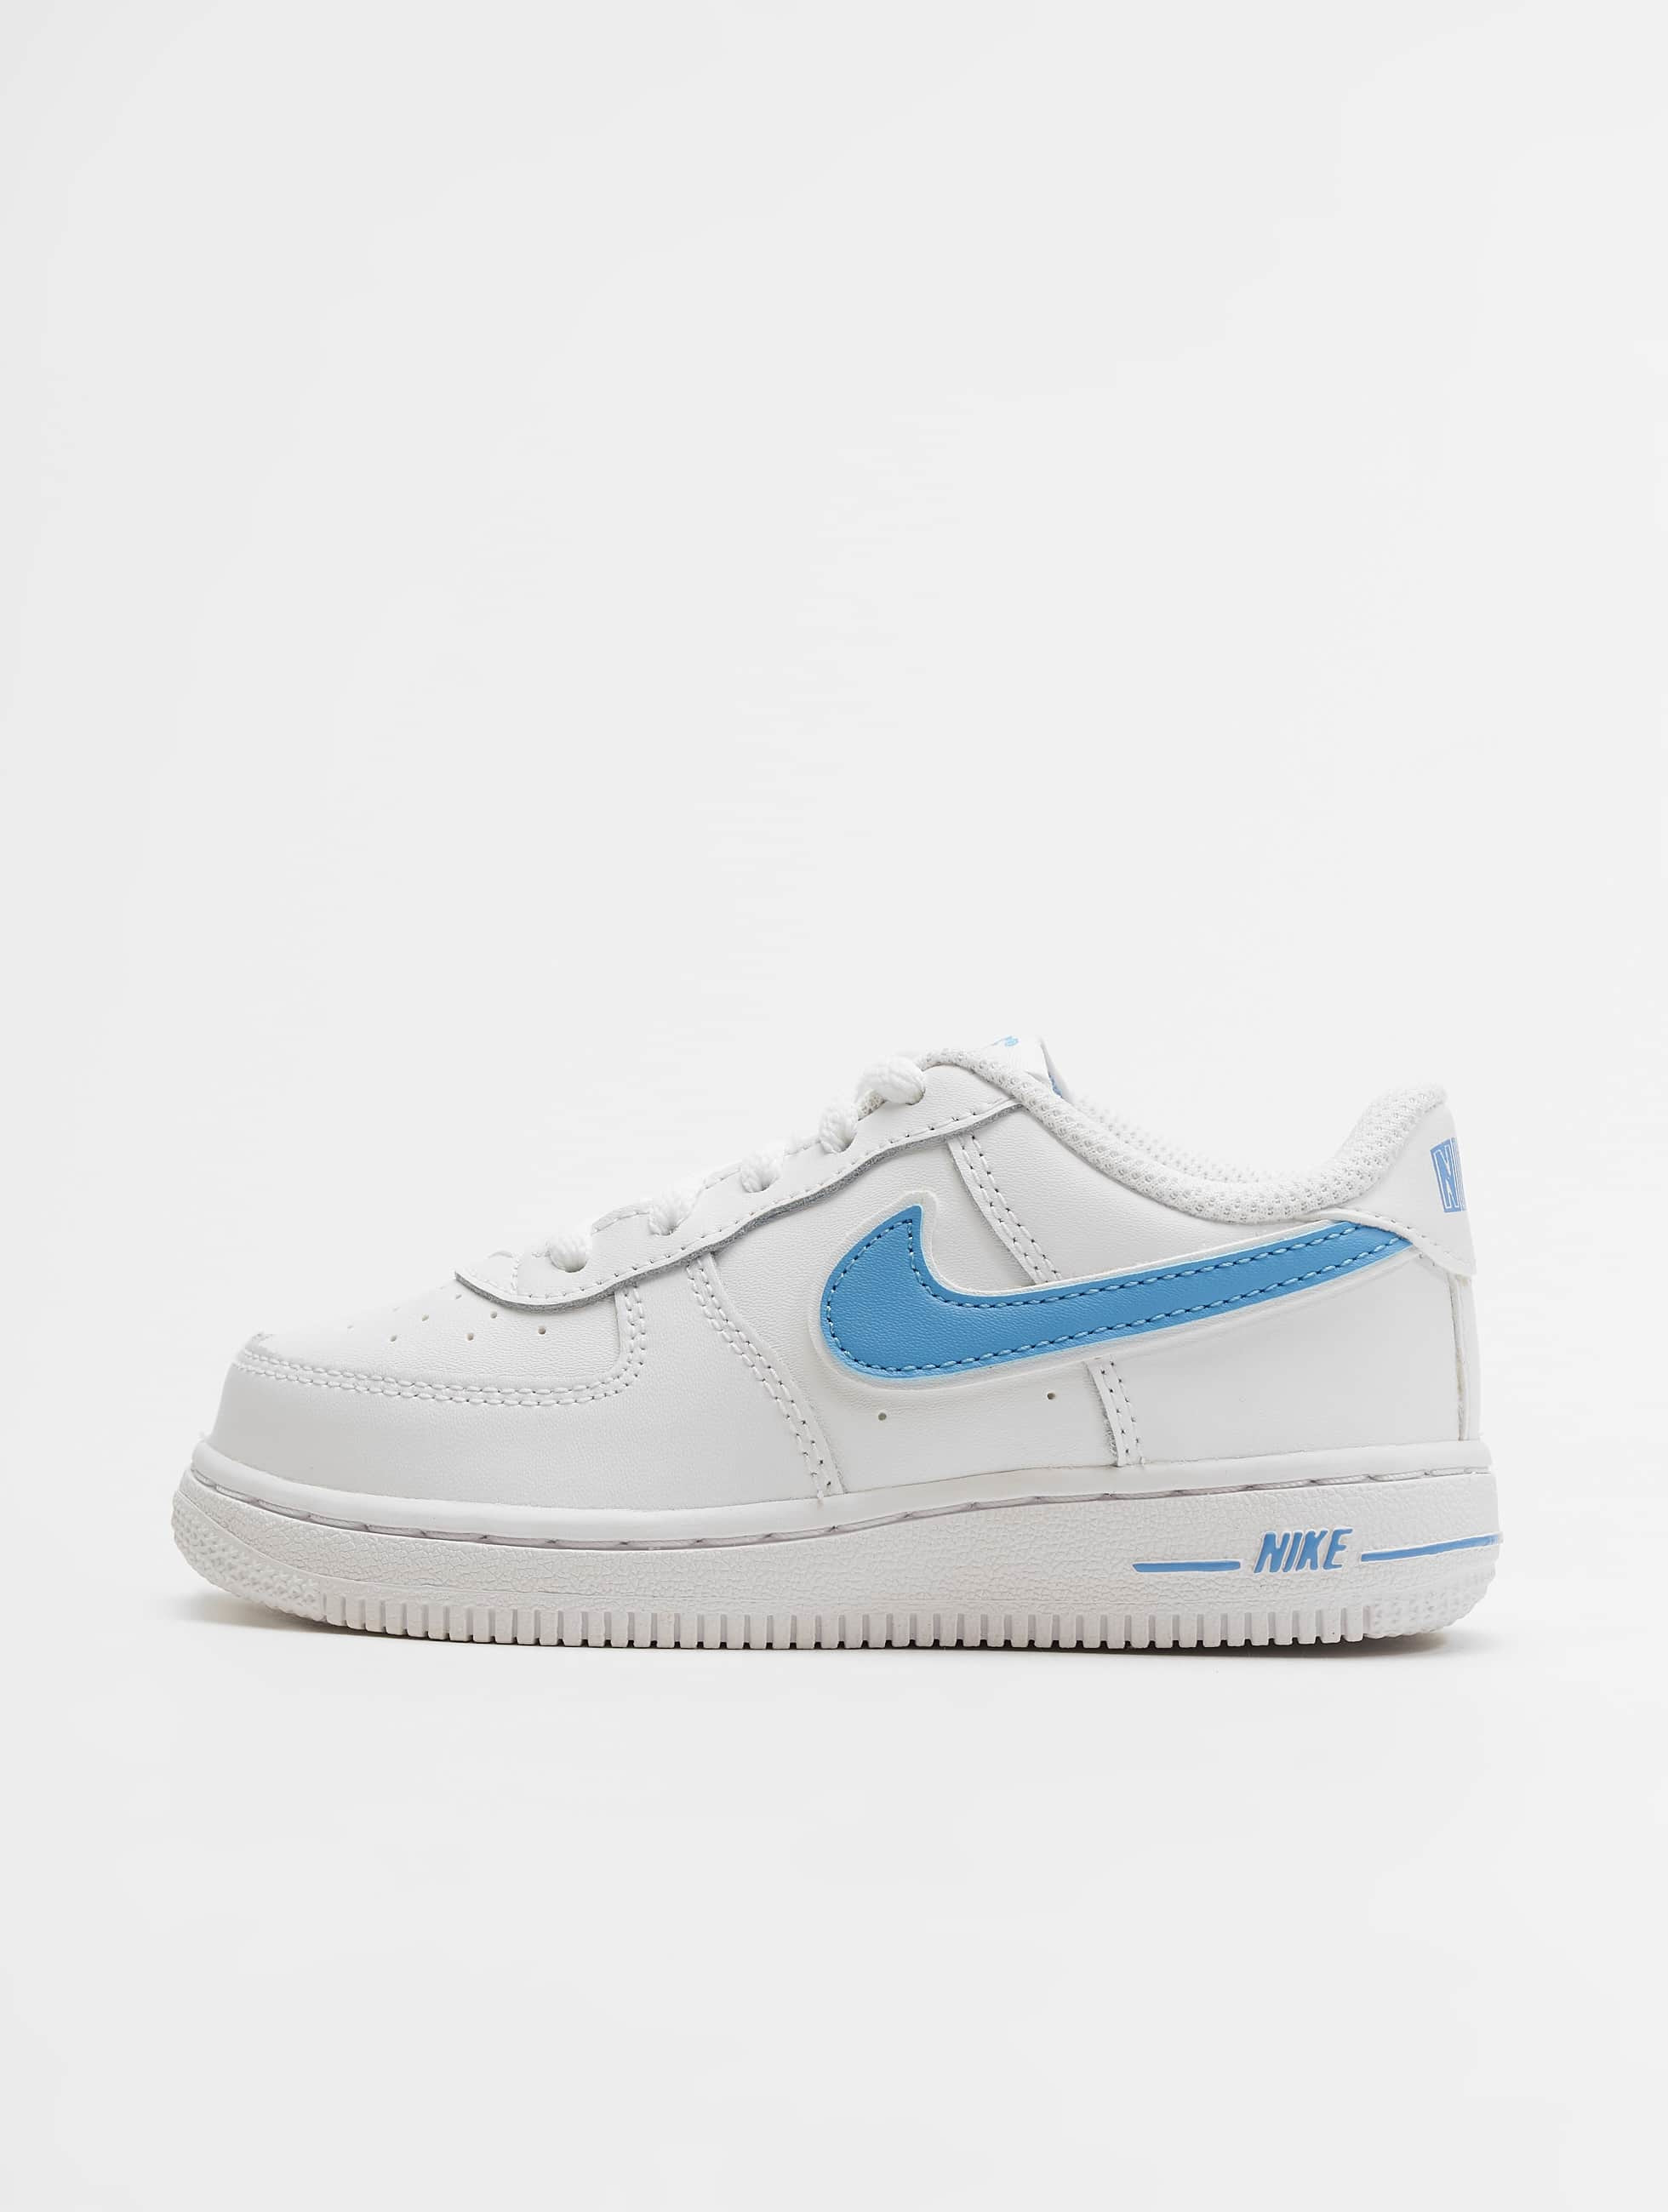 1 Blue 3tdSneakers Whiteuniversity Nike Force PiukXZ